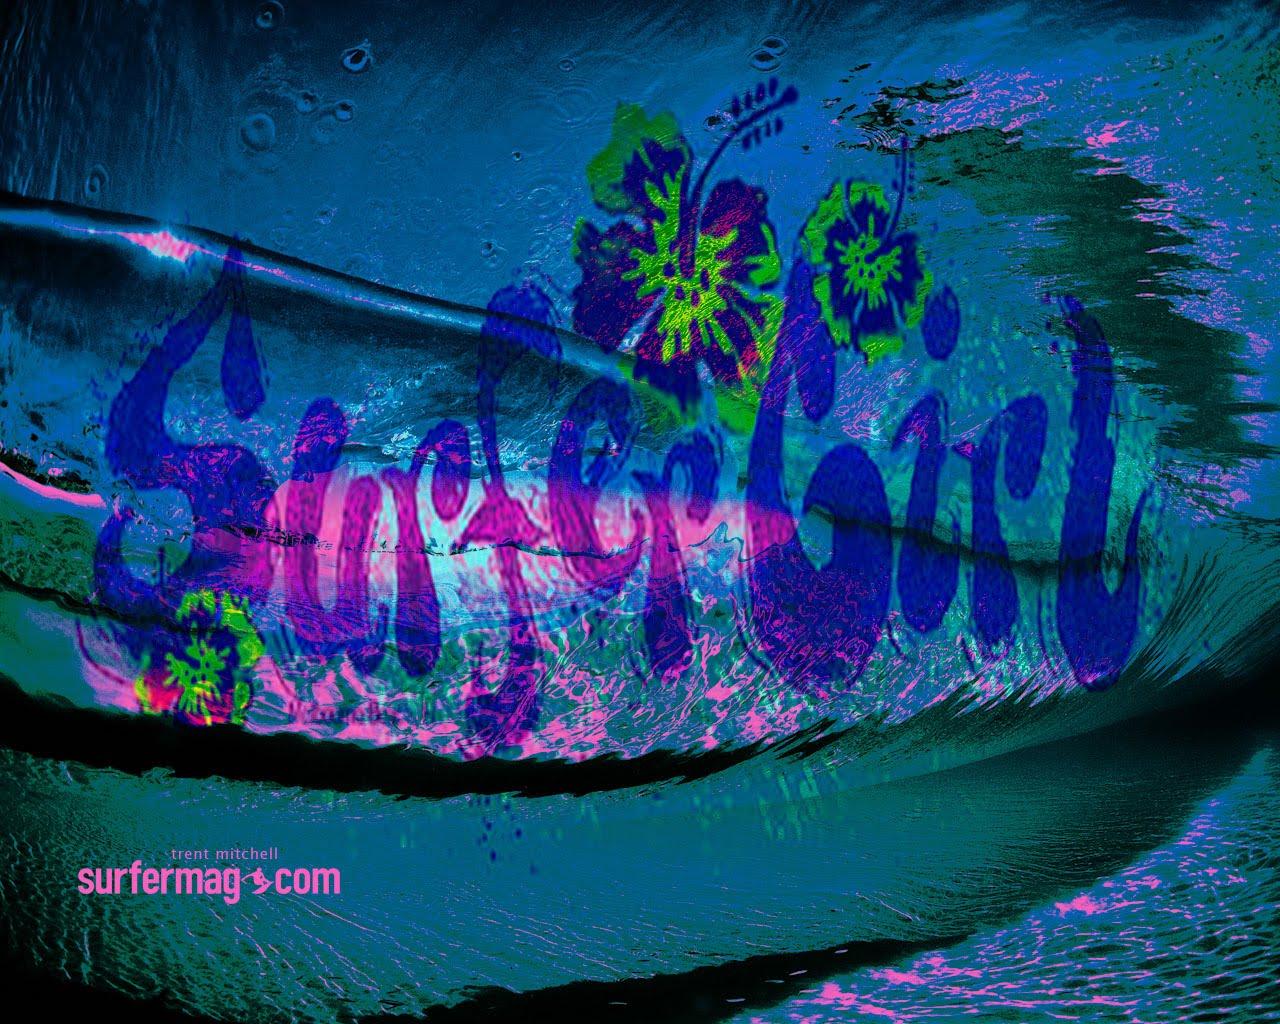 http://4.bp.blogspot.com/_Kd1kmBXrP7o/THQX9-uWhHI/AAAAAAAABl4/sVyptgcSWXs/s1600/trentmitchh-1280+2copy.jpg